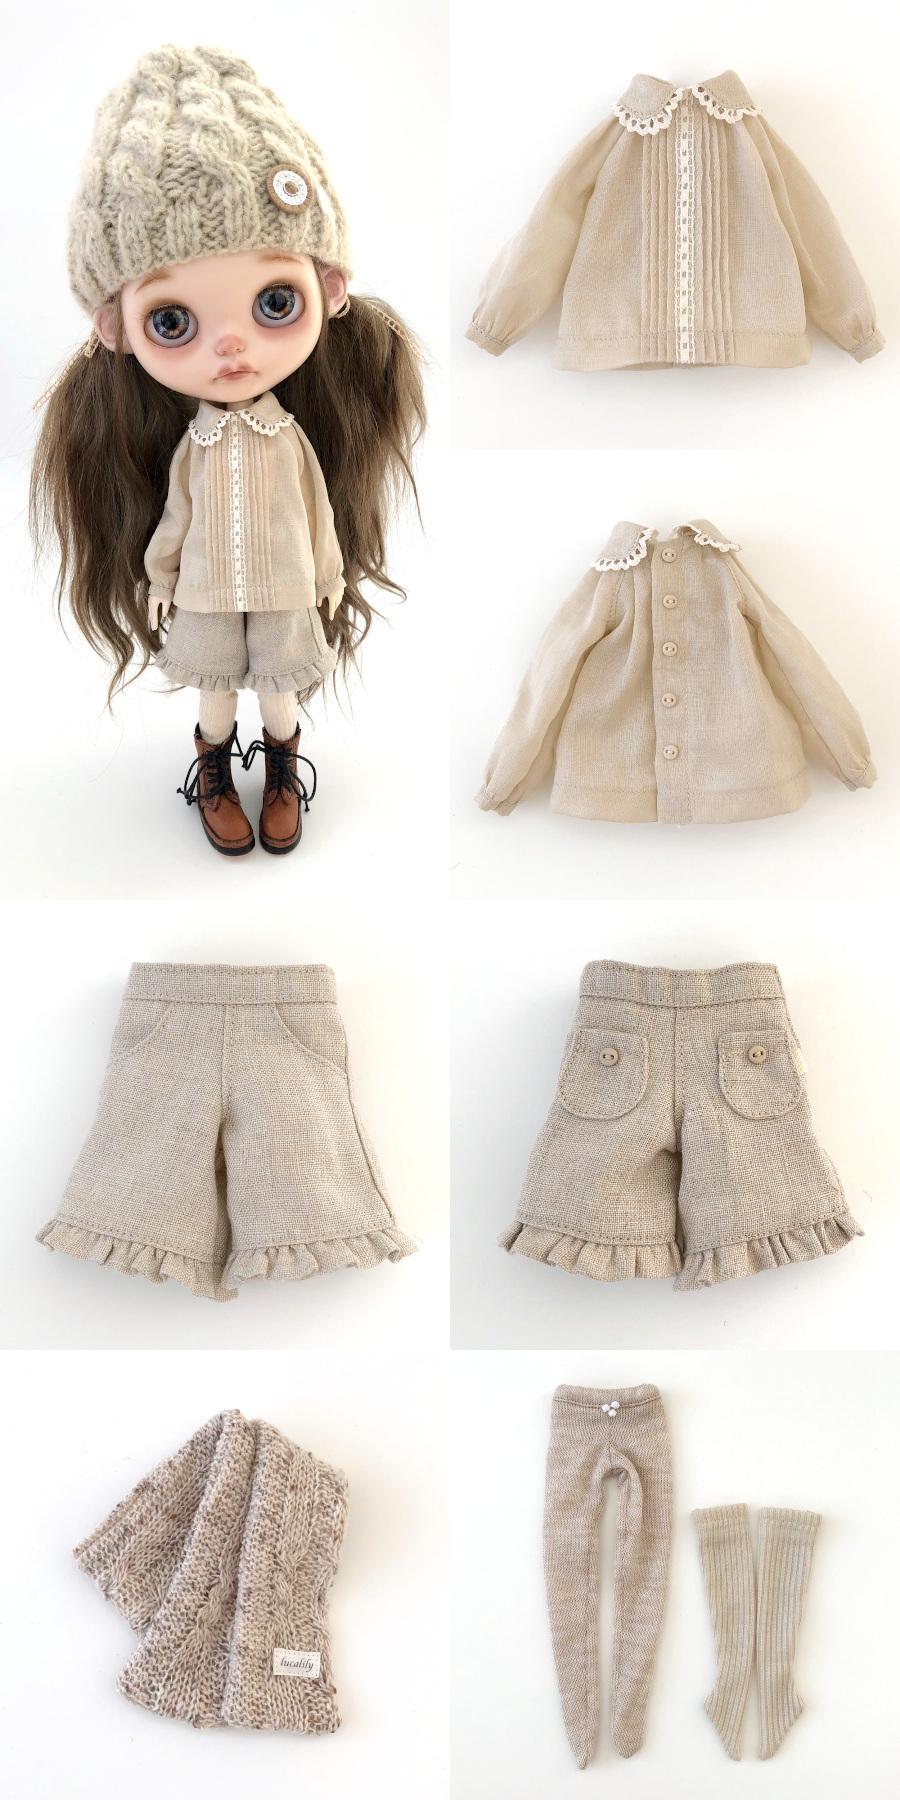 *lucalily * dolls clothes* Herringbone duffle coat set *_d0217189_19075907.jpg